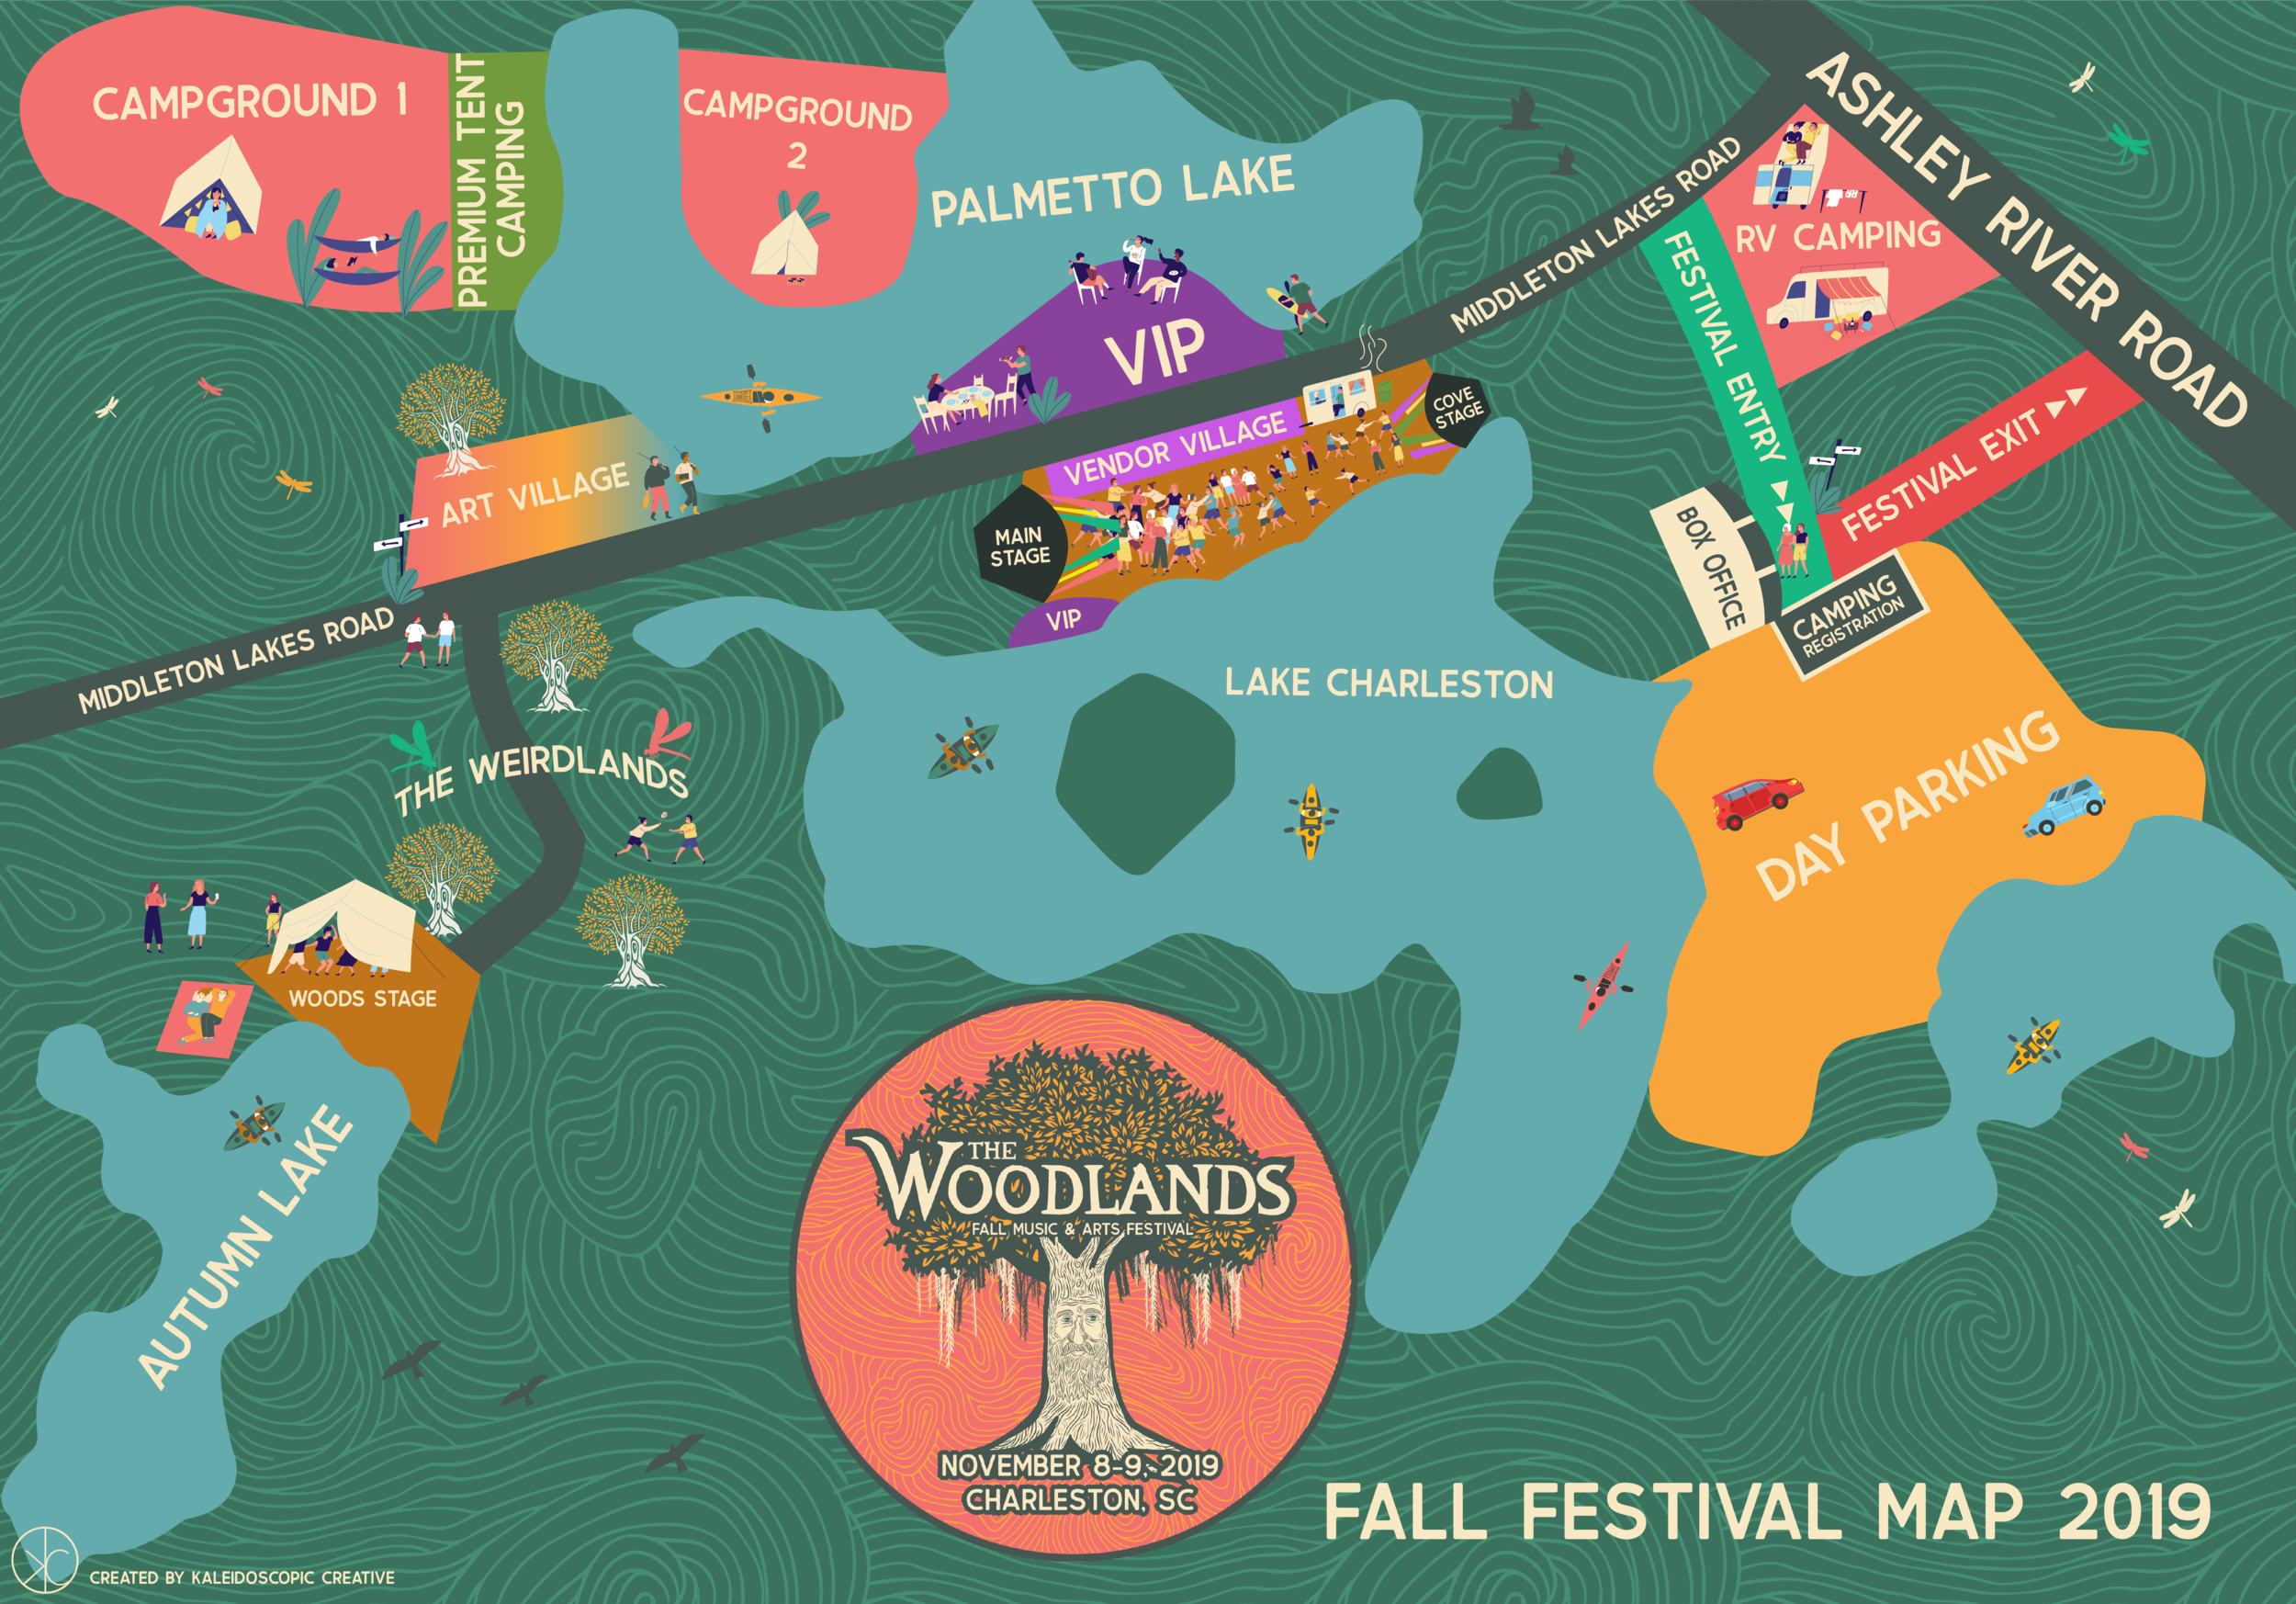 Woodlands-map-01.png